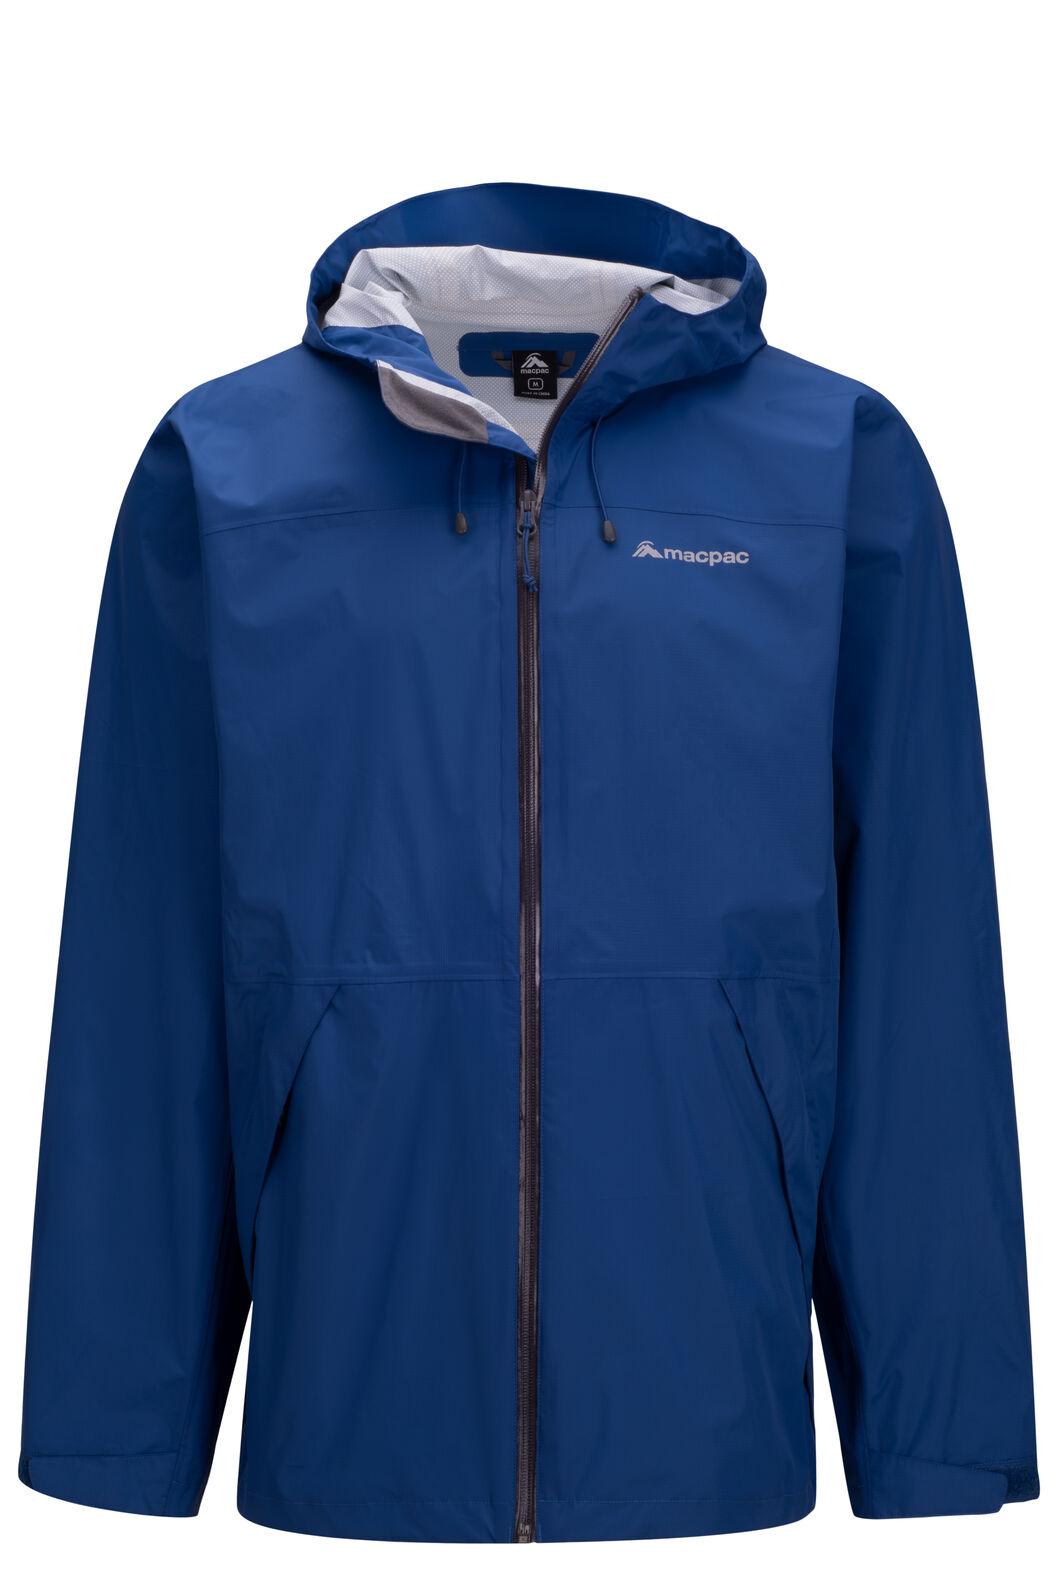 Macpac Men's Mistral Rain Jacket, Limoges, hi-res